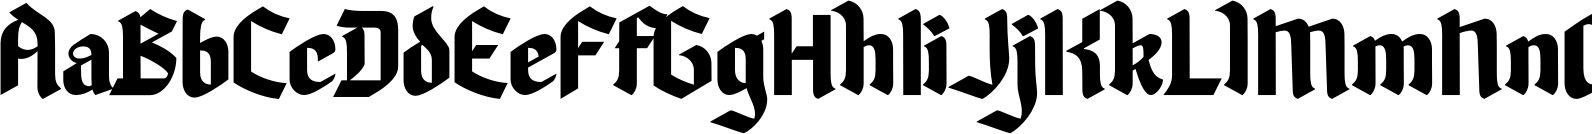 Ribolla